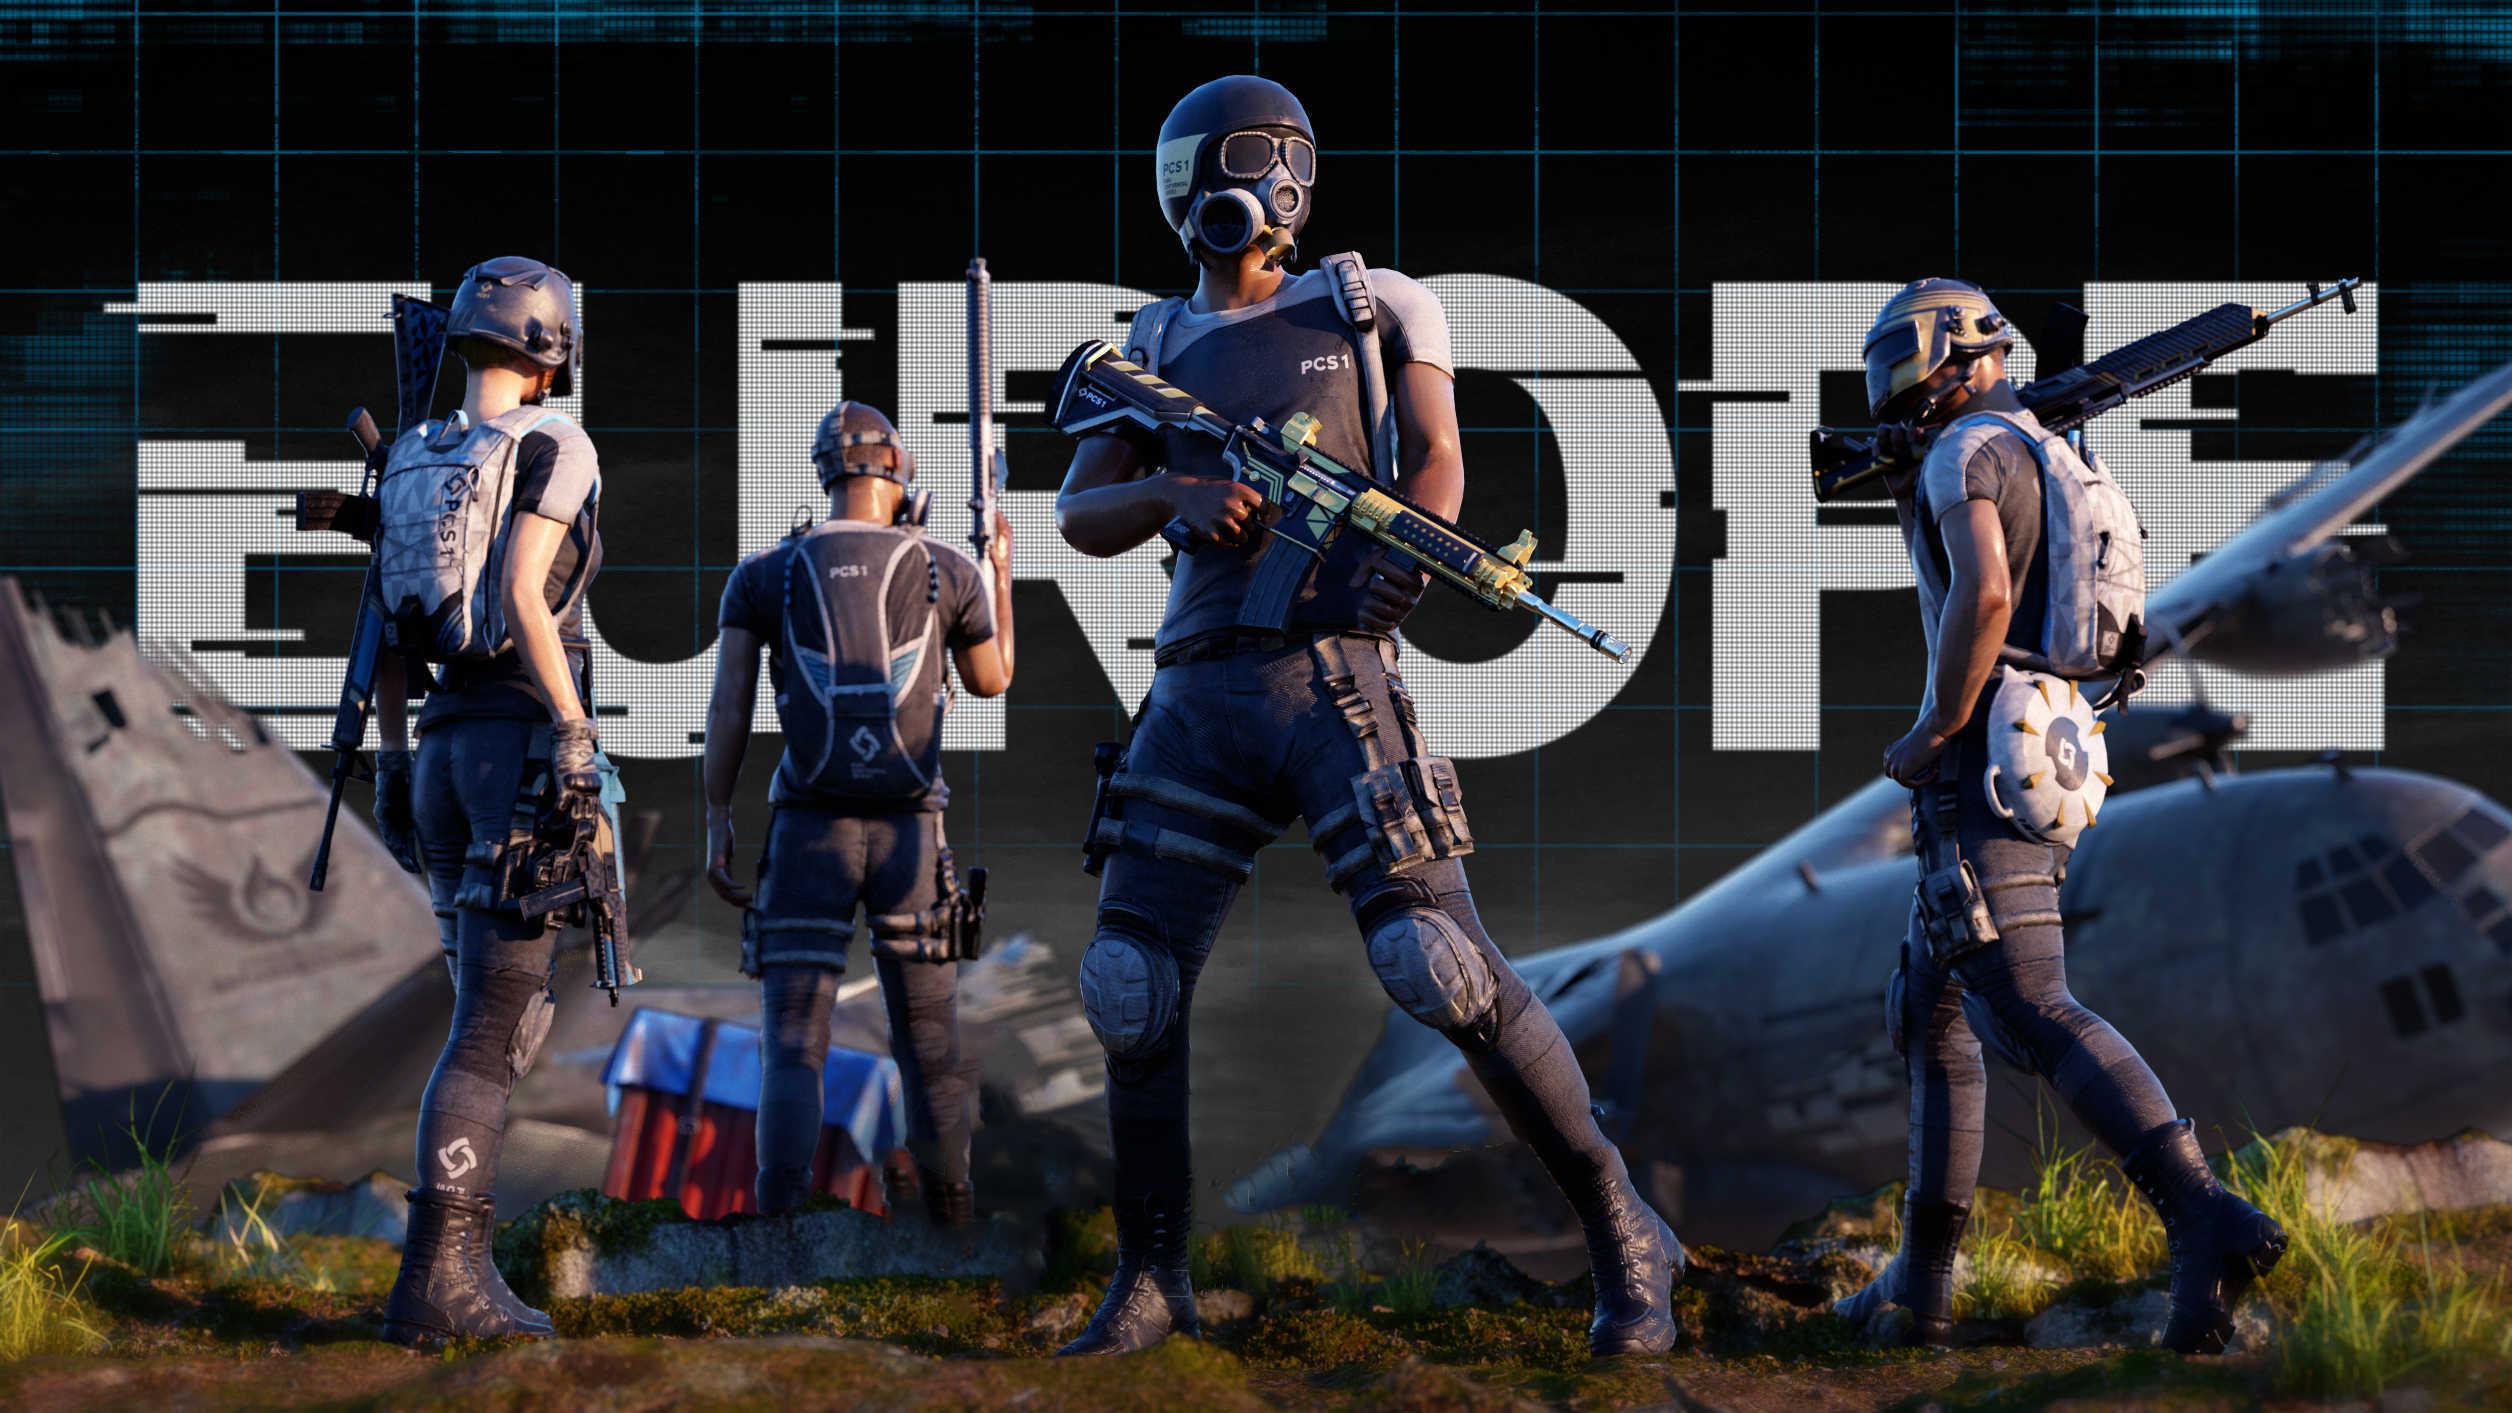 Video Game Playerunknown's Battlegrounds Battlegrounds Hd Wallpaper _ Background Ima_0102 Playerunknown's